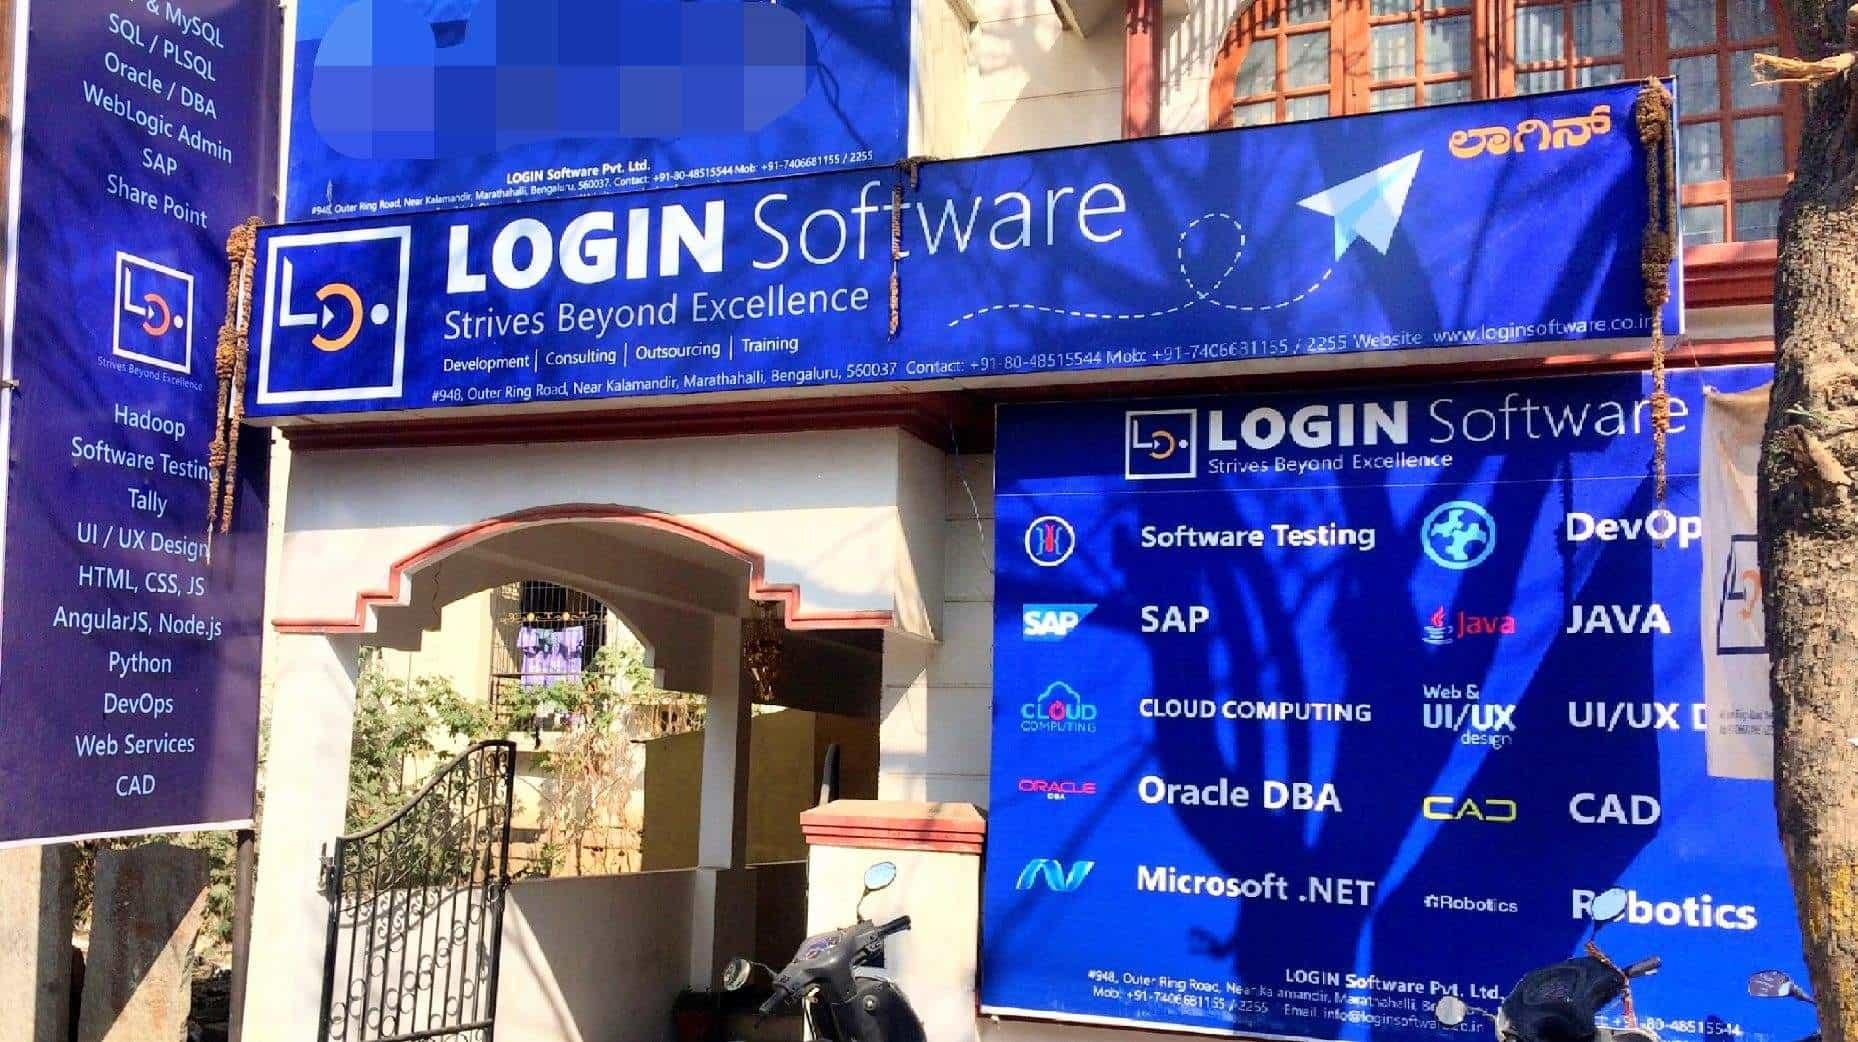 Login Software Pvt Ltd, Marathahalli - Computer Training